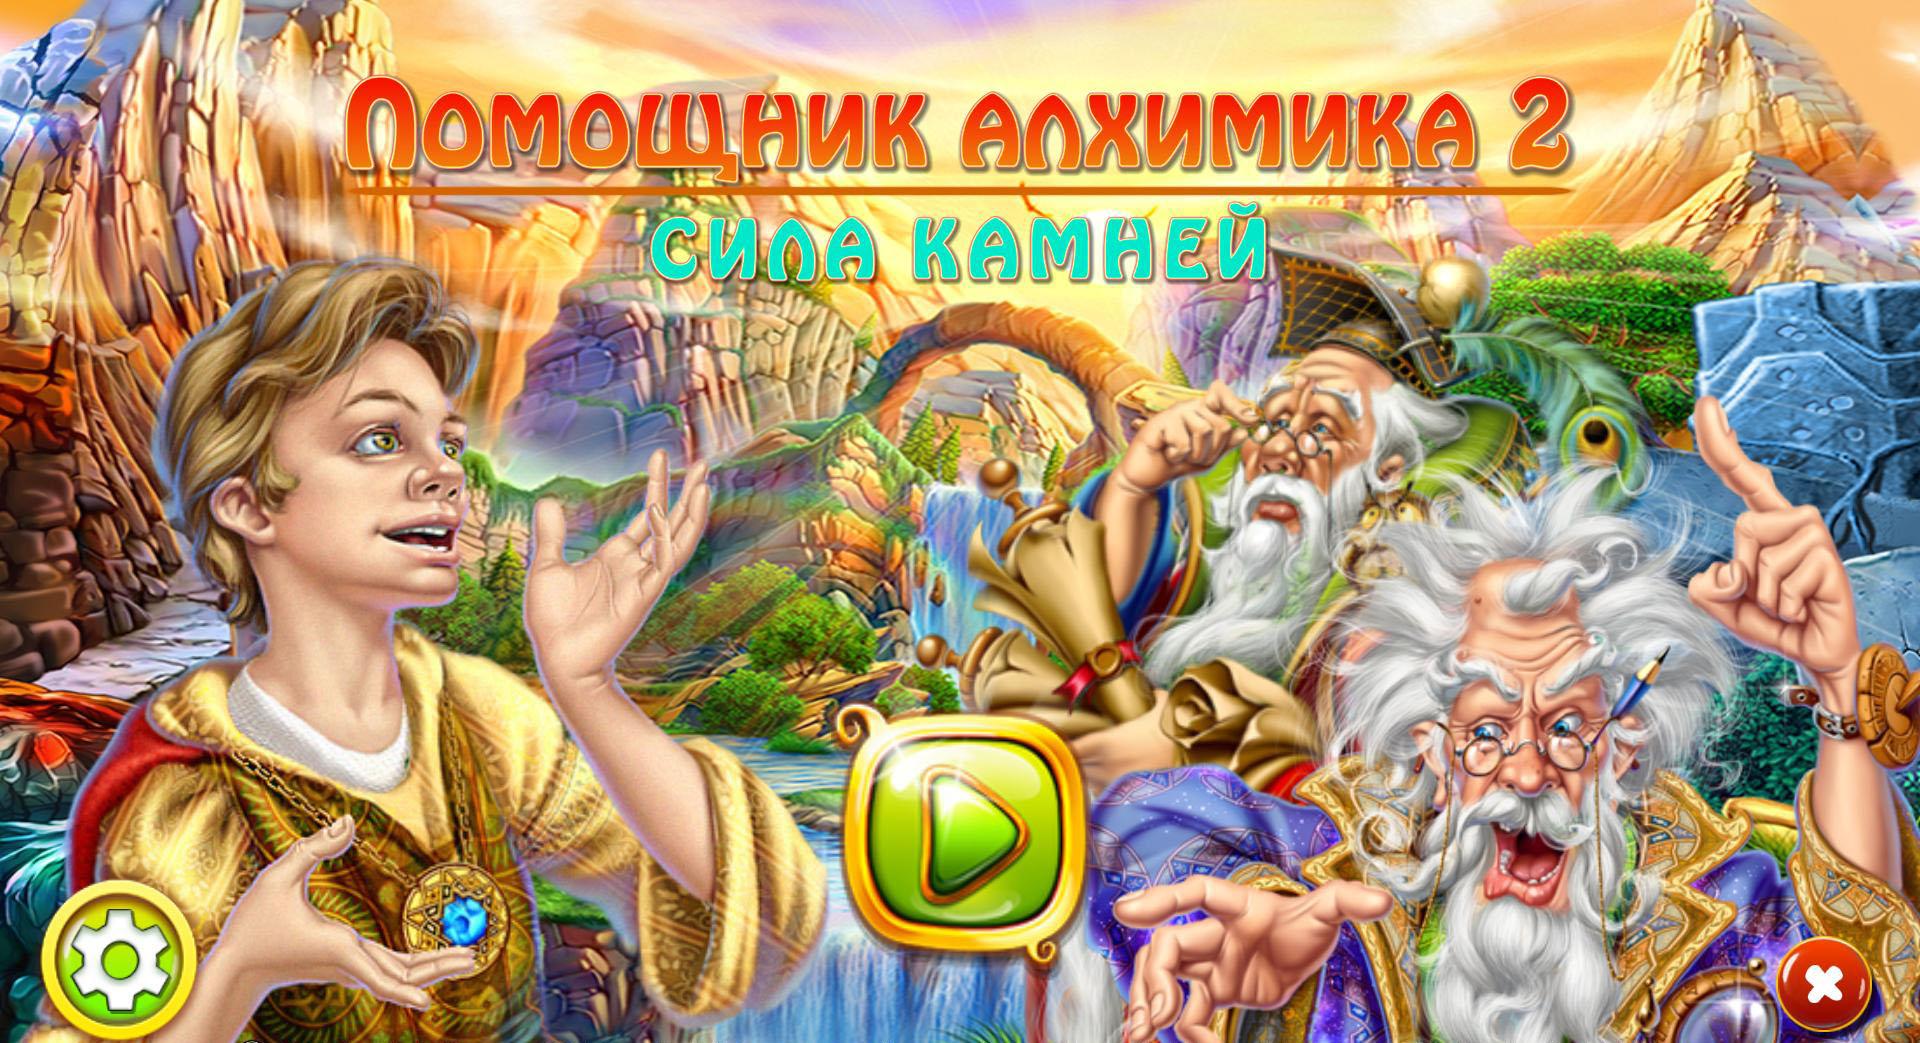 Помощник Алхимика 2: Сила камней | Alchemist's Apprentice 2: Strength of Stones (Rus | En)